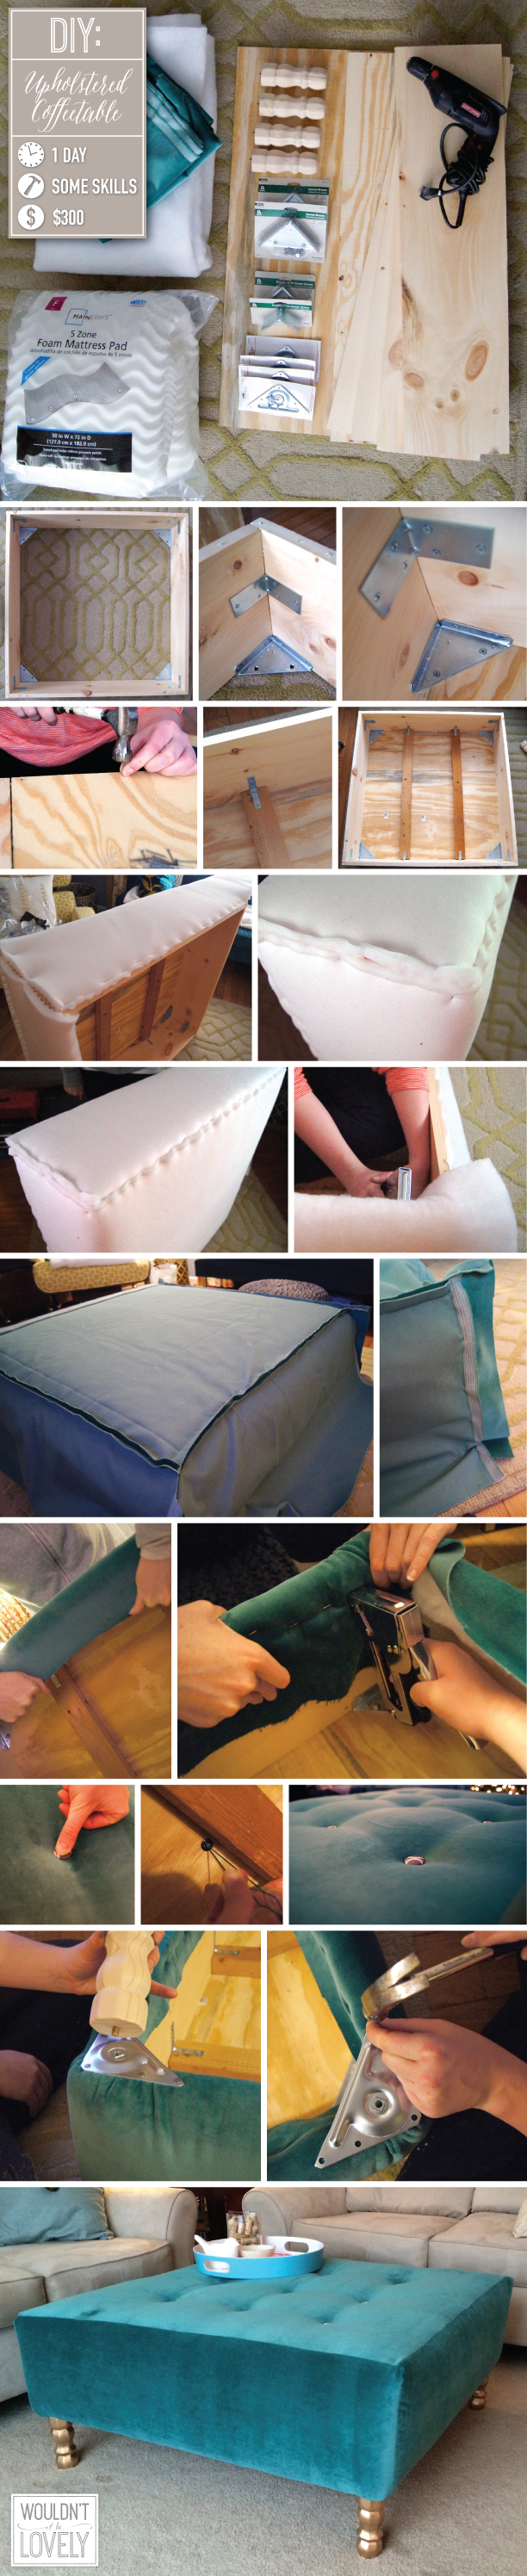 DIY upholstered ottoman coffee table